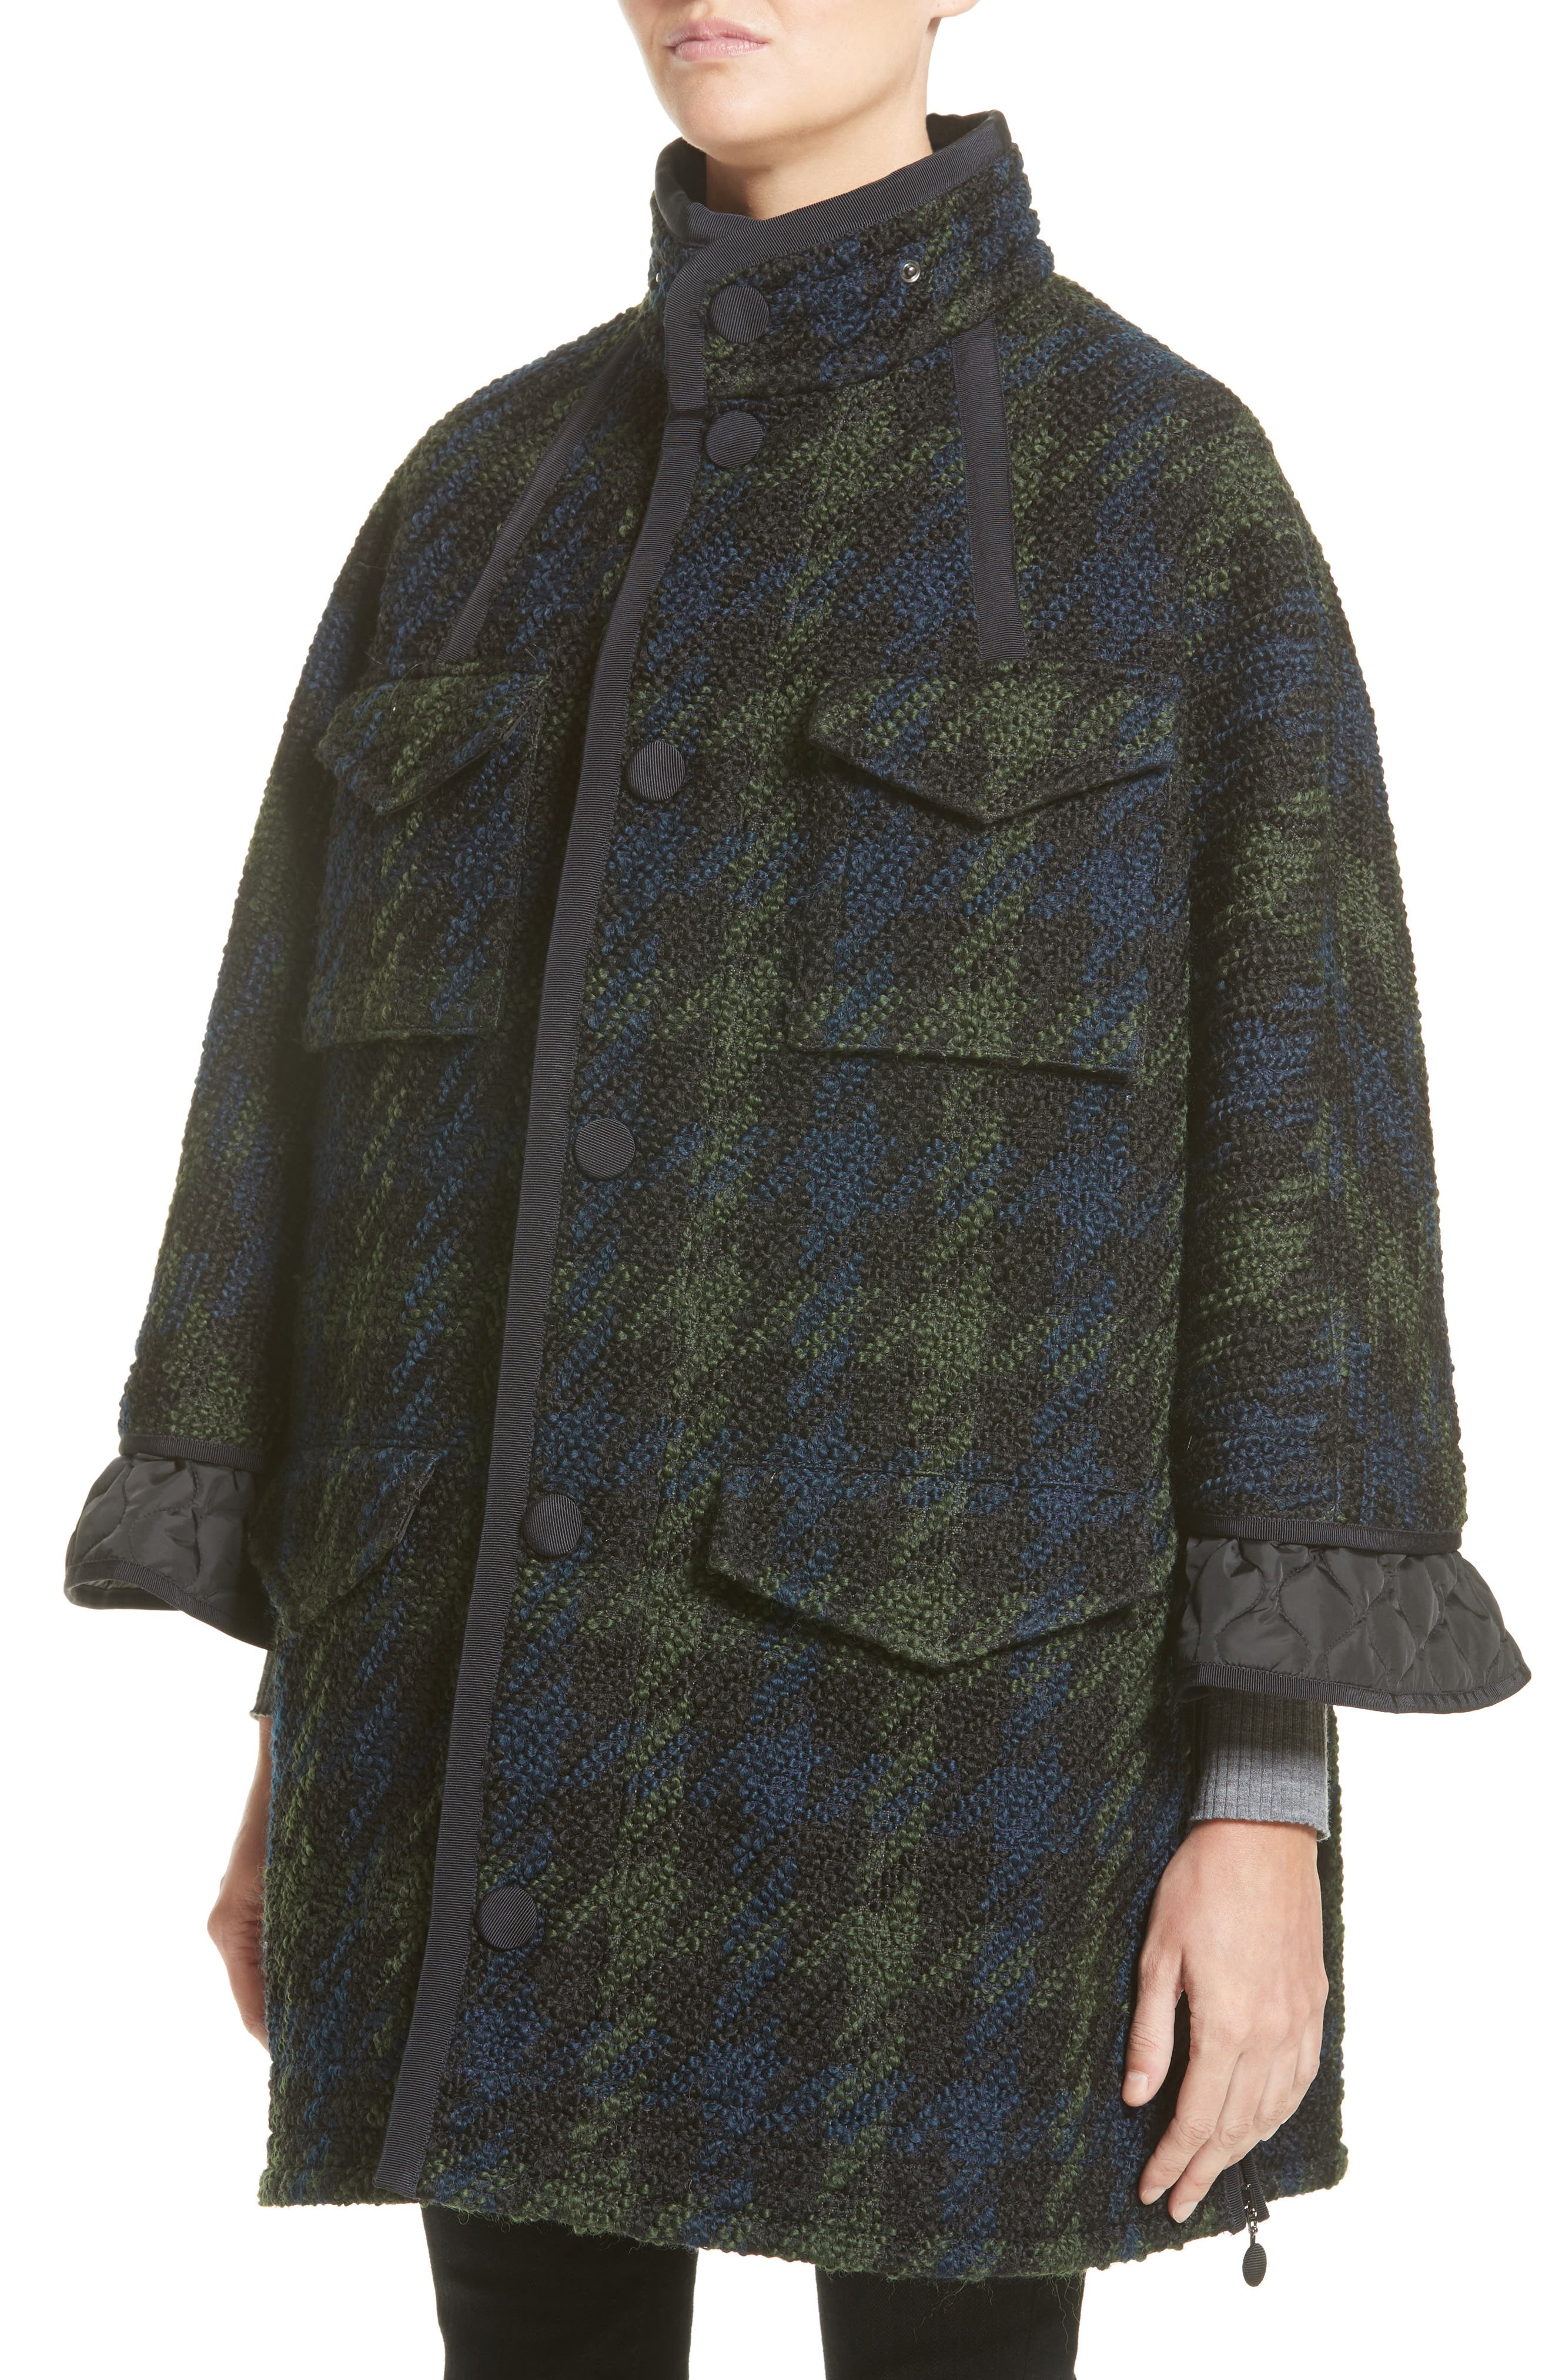 Euphrasie Wool Blend Houndstooth Coat,                             Alternate thumbnail 3, color,